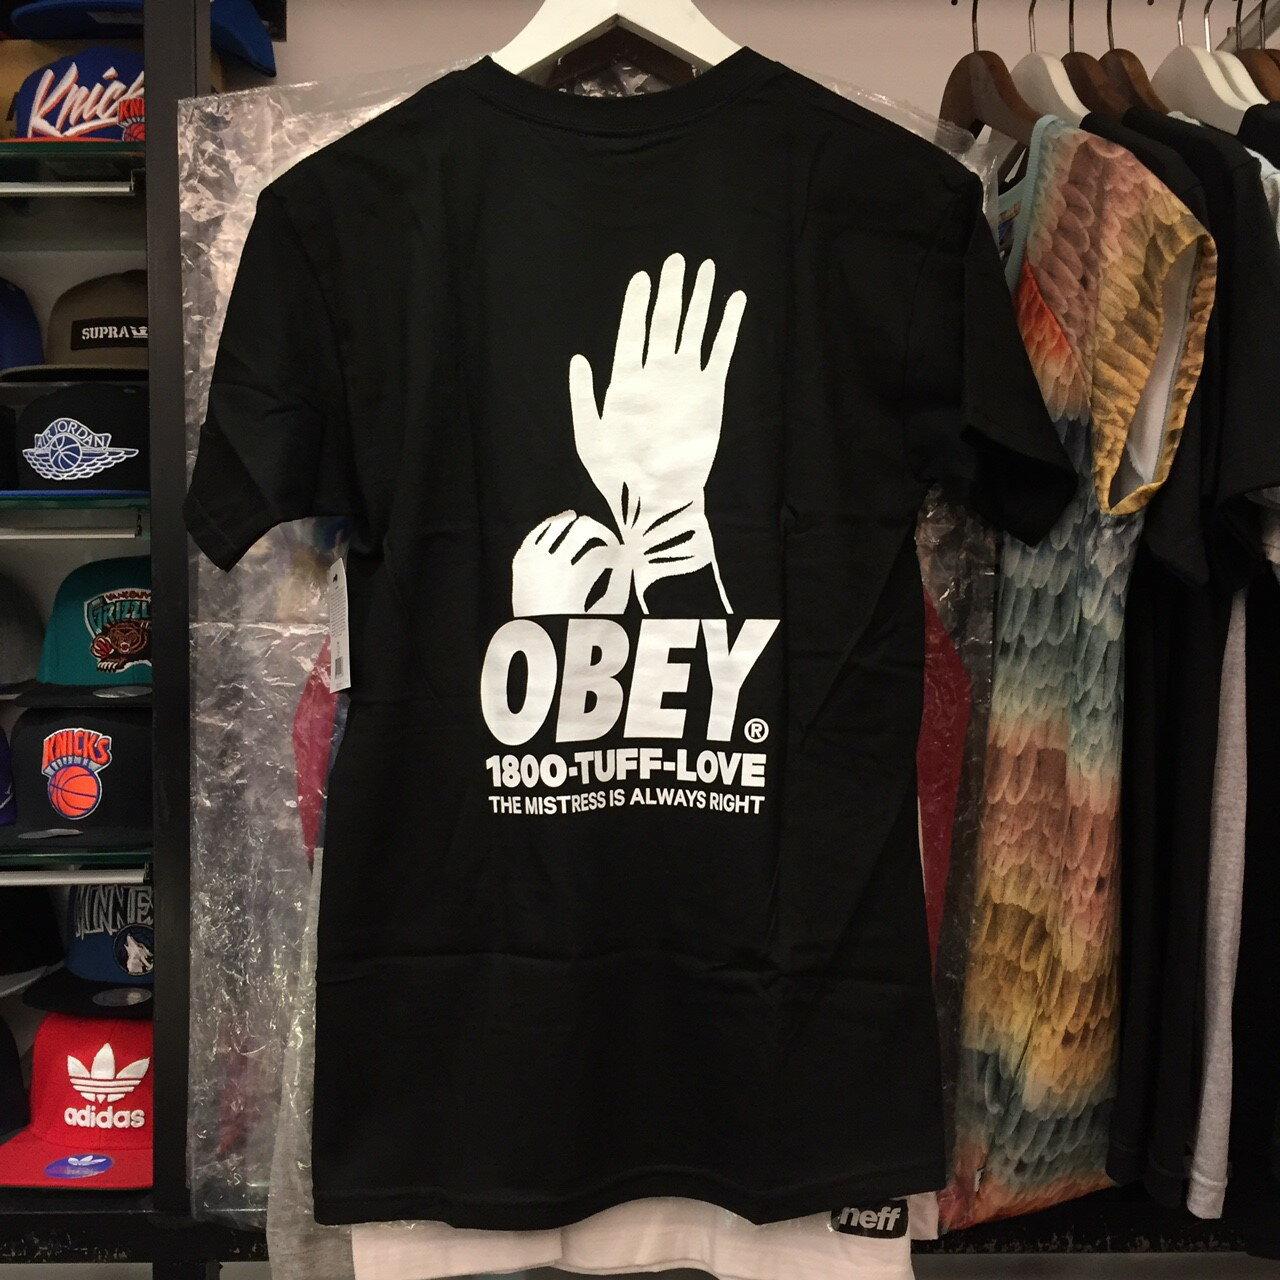 BEETLE PLUS 西門町經銷 全新 美國品牌 OBEY TUFF LOVE TEE 1800 手掌 圖樣 全黑 白字 黑白 LOGO 短T TEE 163081162BLK OB-416 1